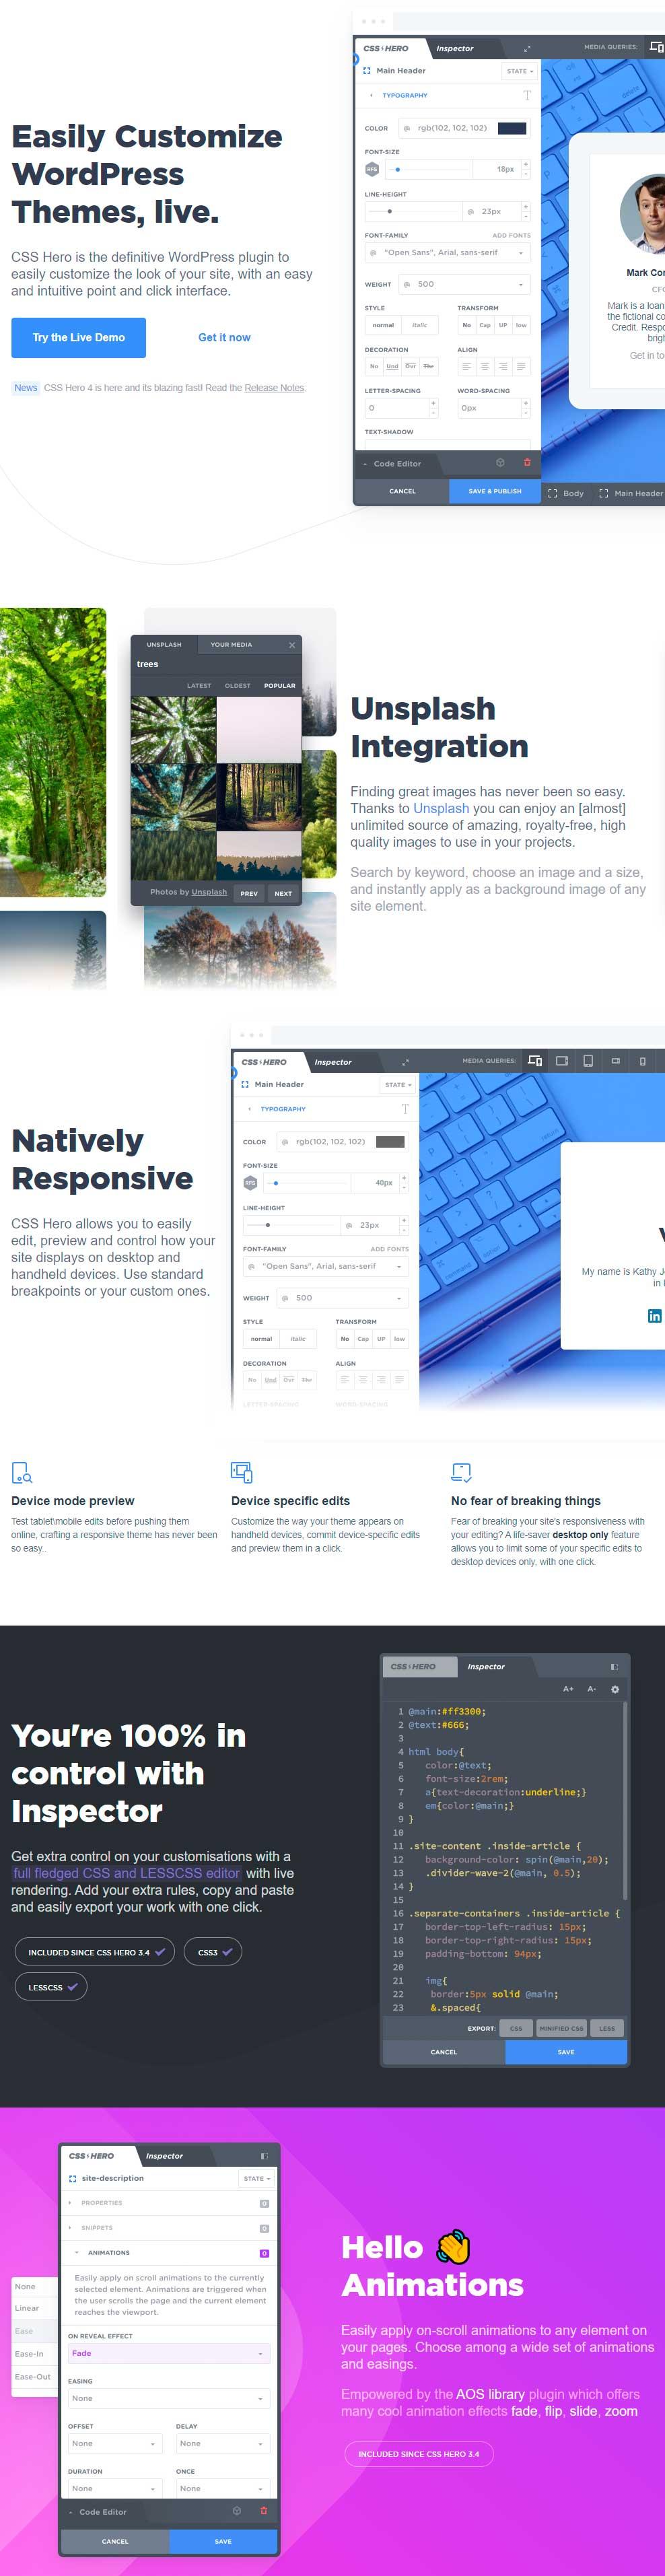 CSS Hero - WordPress CSS Editor Plugin